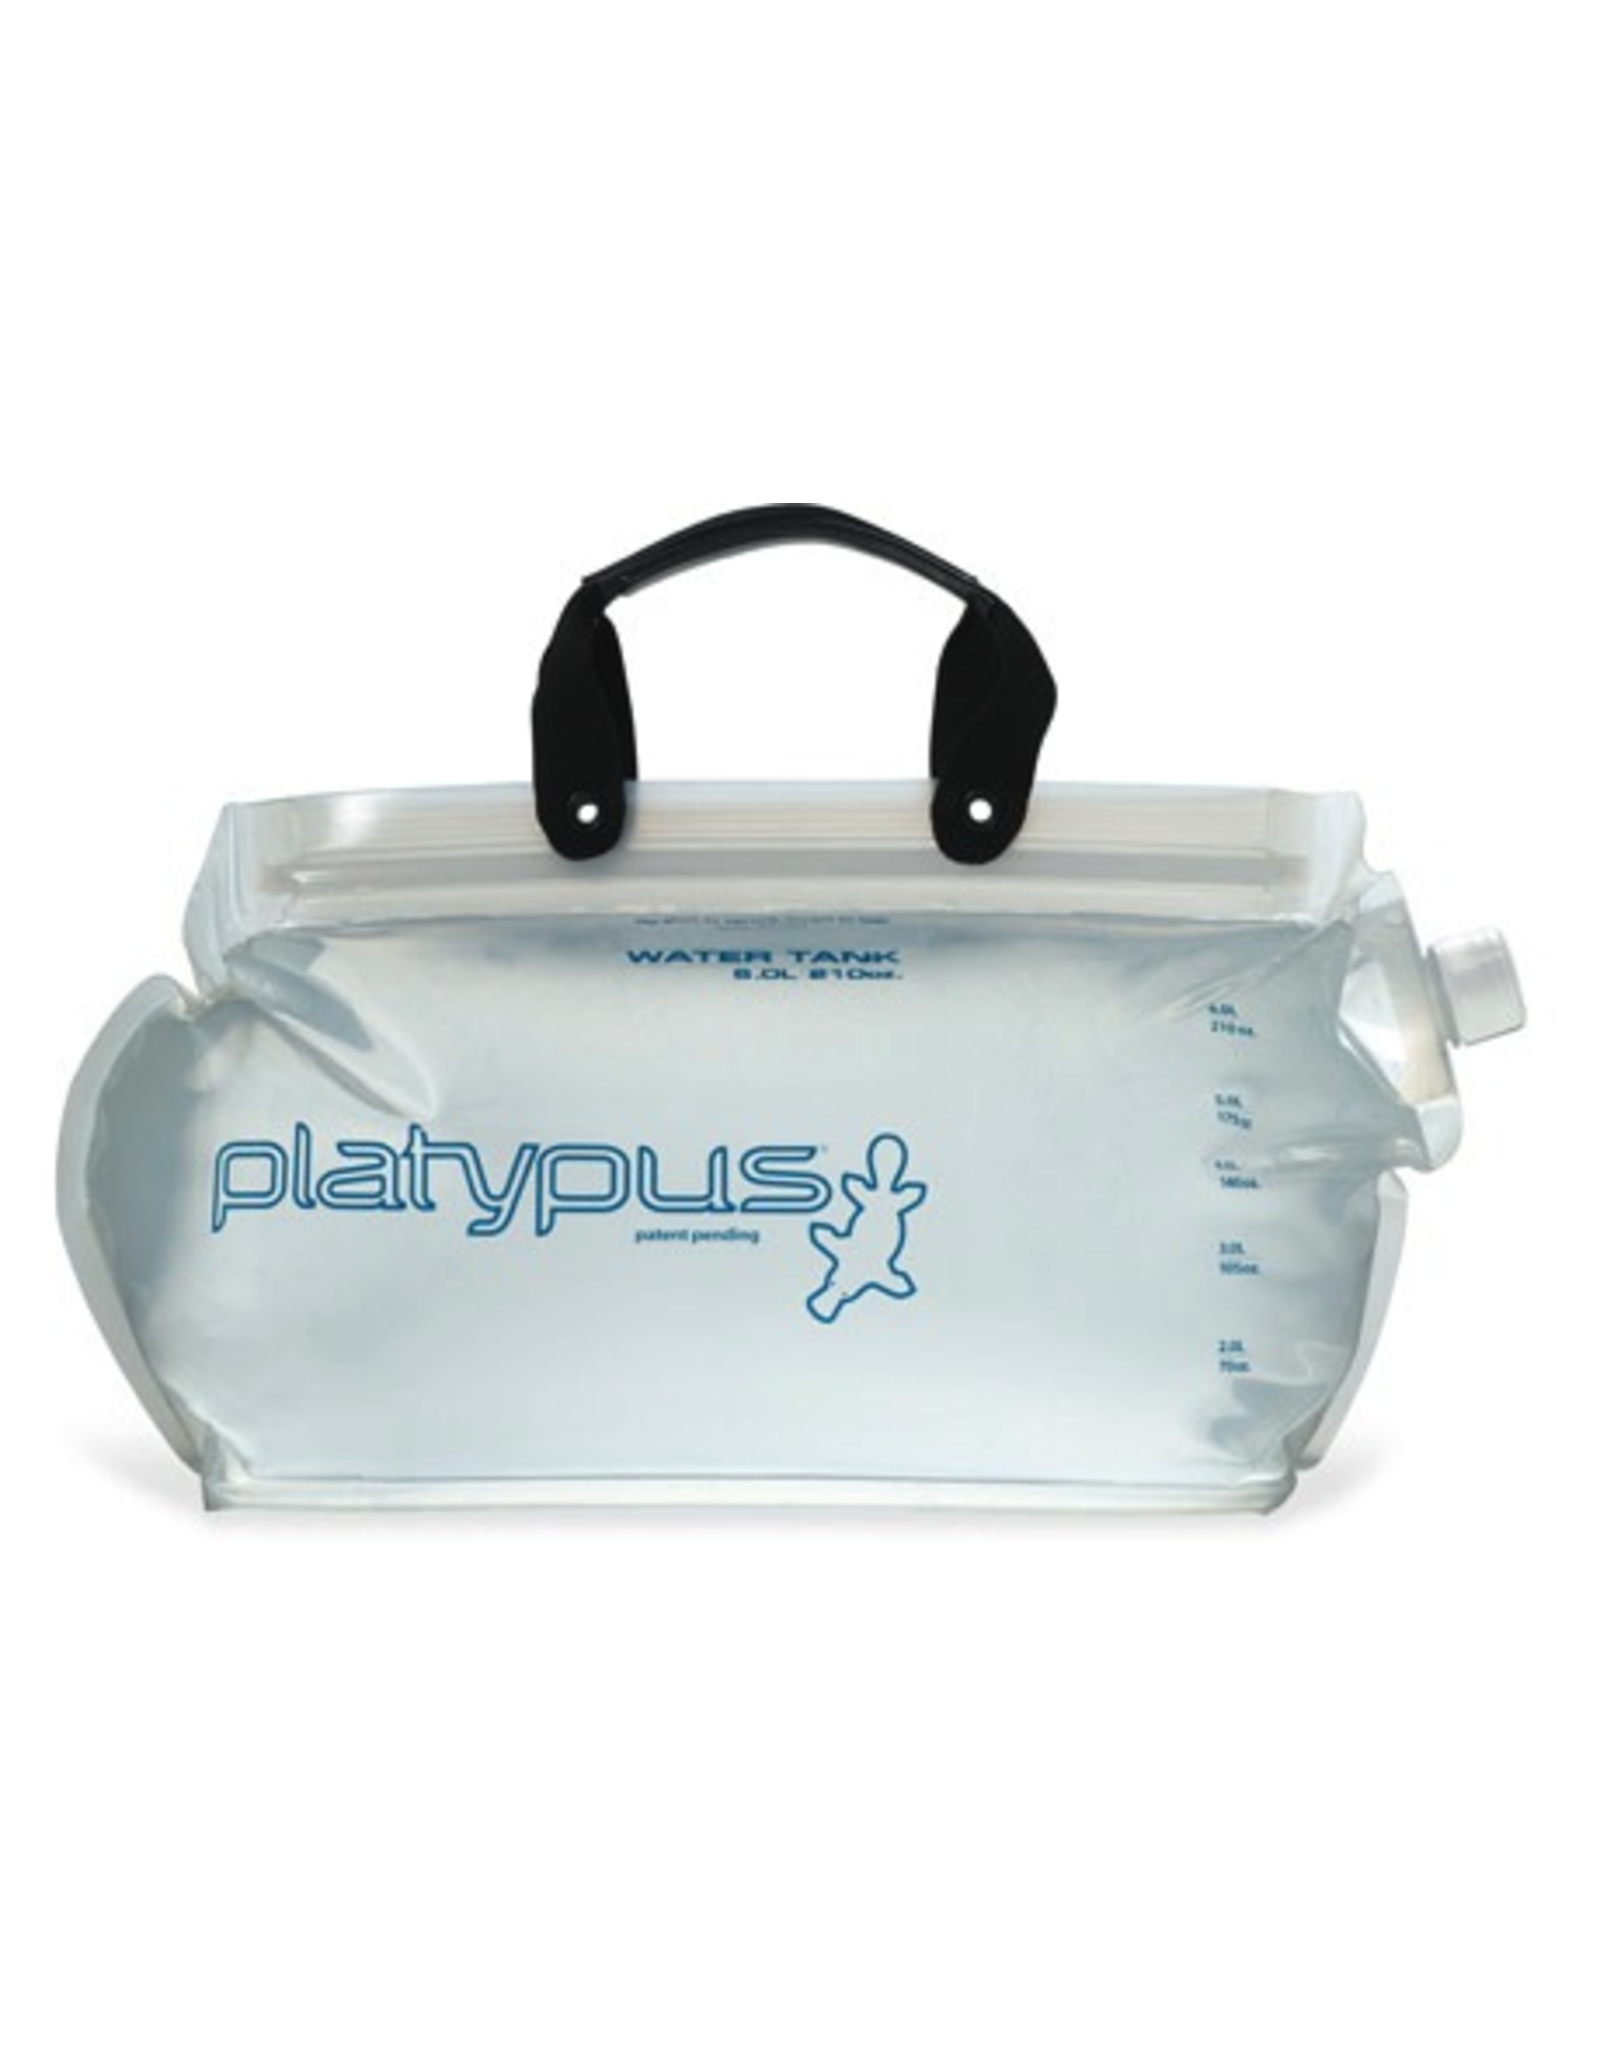 Platypus Platypus Platy Water Tank, 6.0L